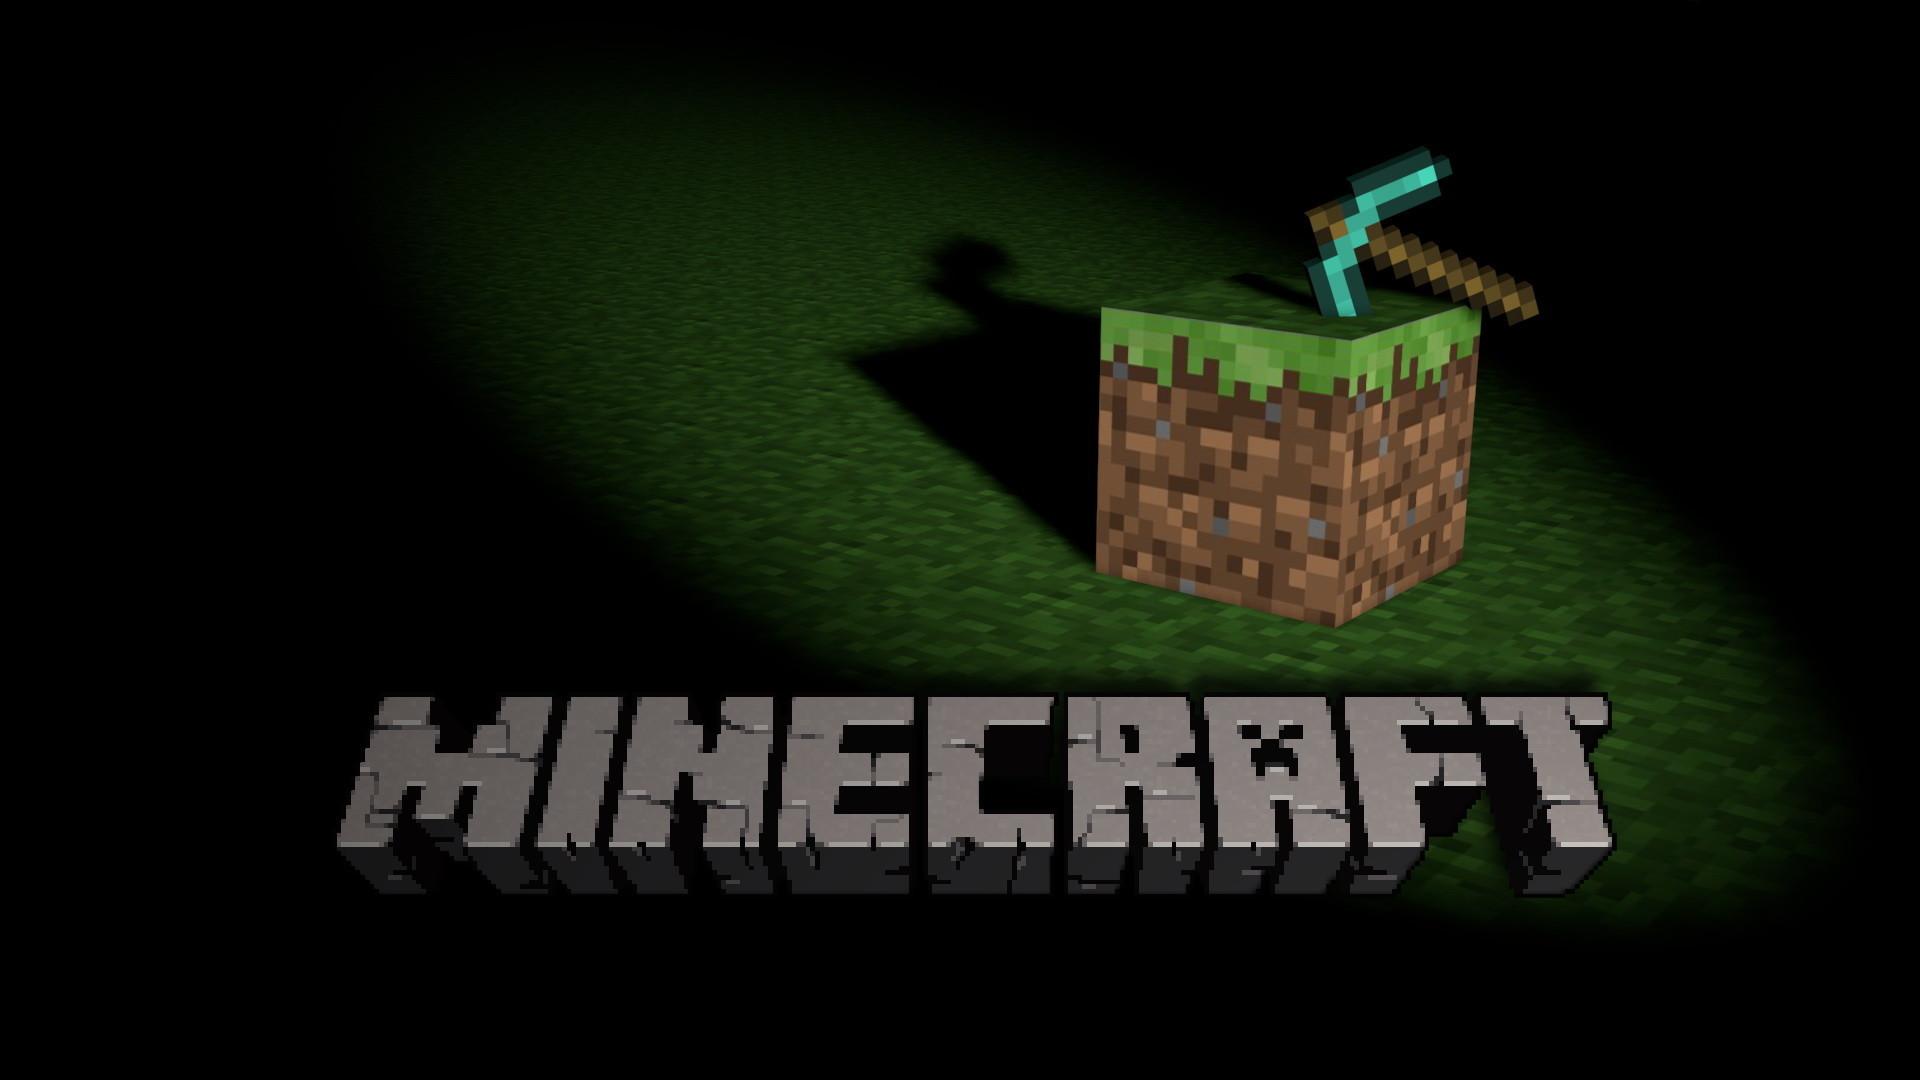 Minecraft Backgrounds For Desktop 68 Pictures